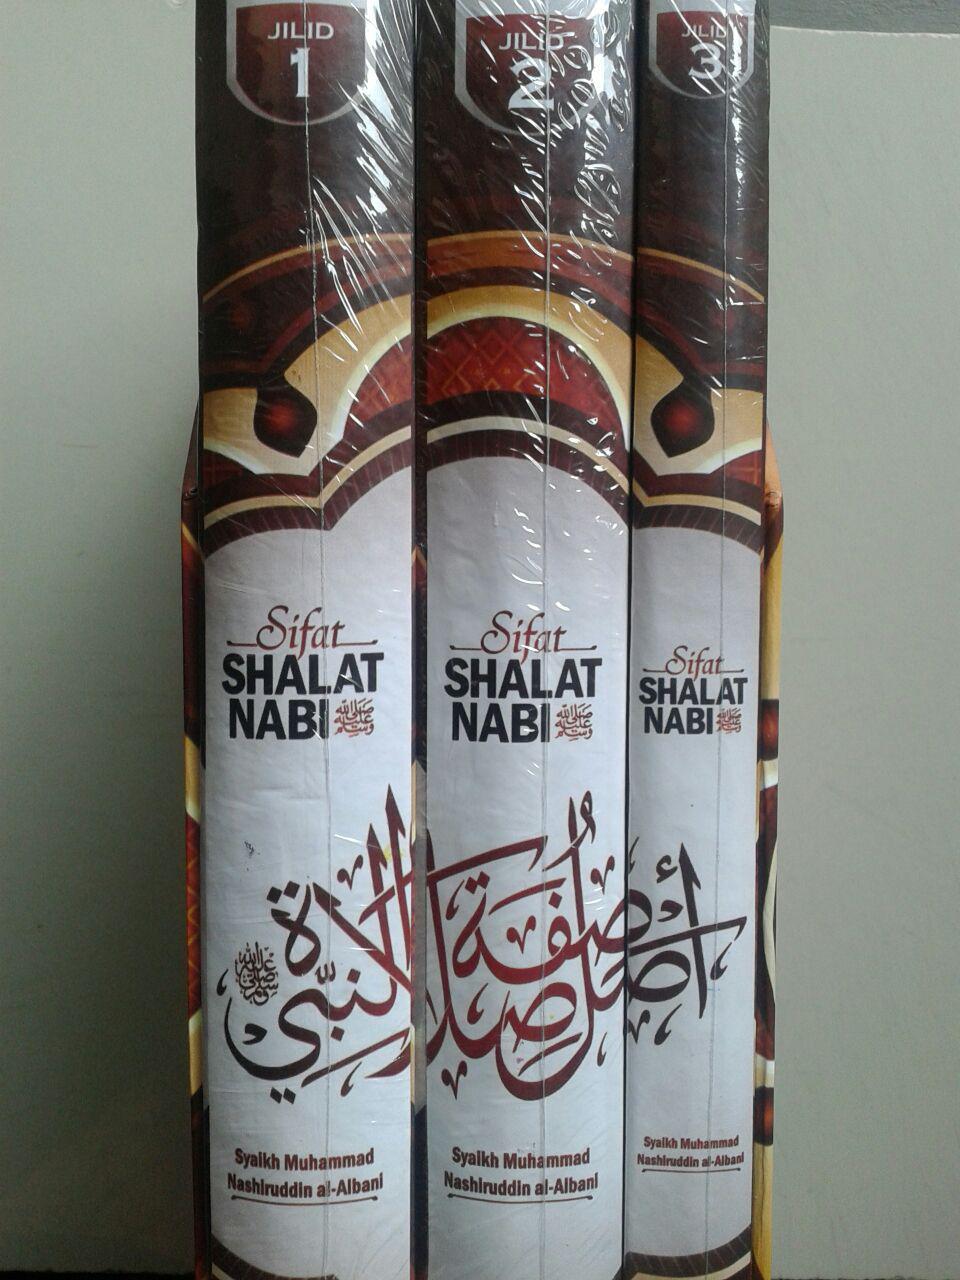 Buku Sifat Shalat Nabi Edisi Lengkap 3 Jilid cover 2